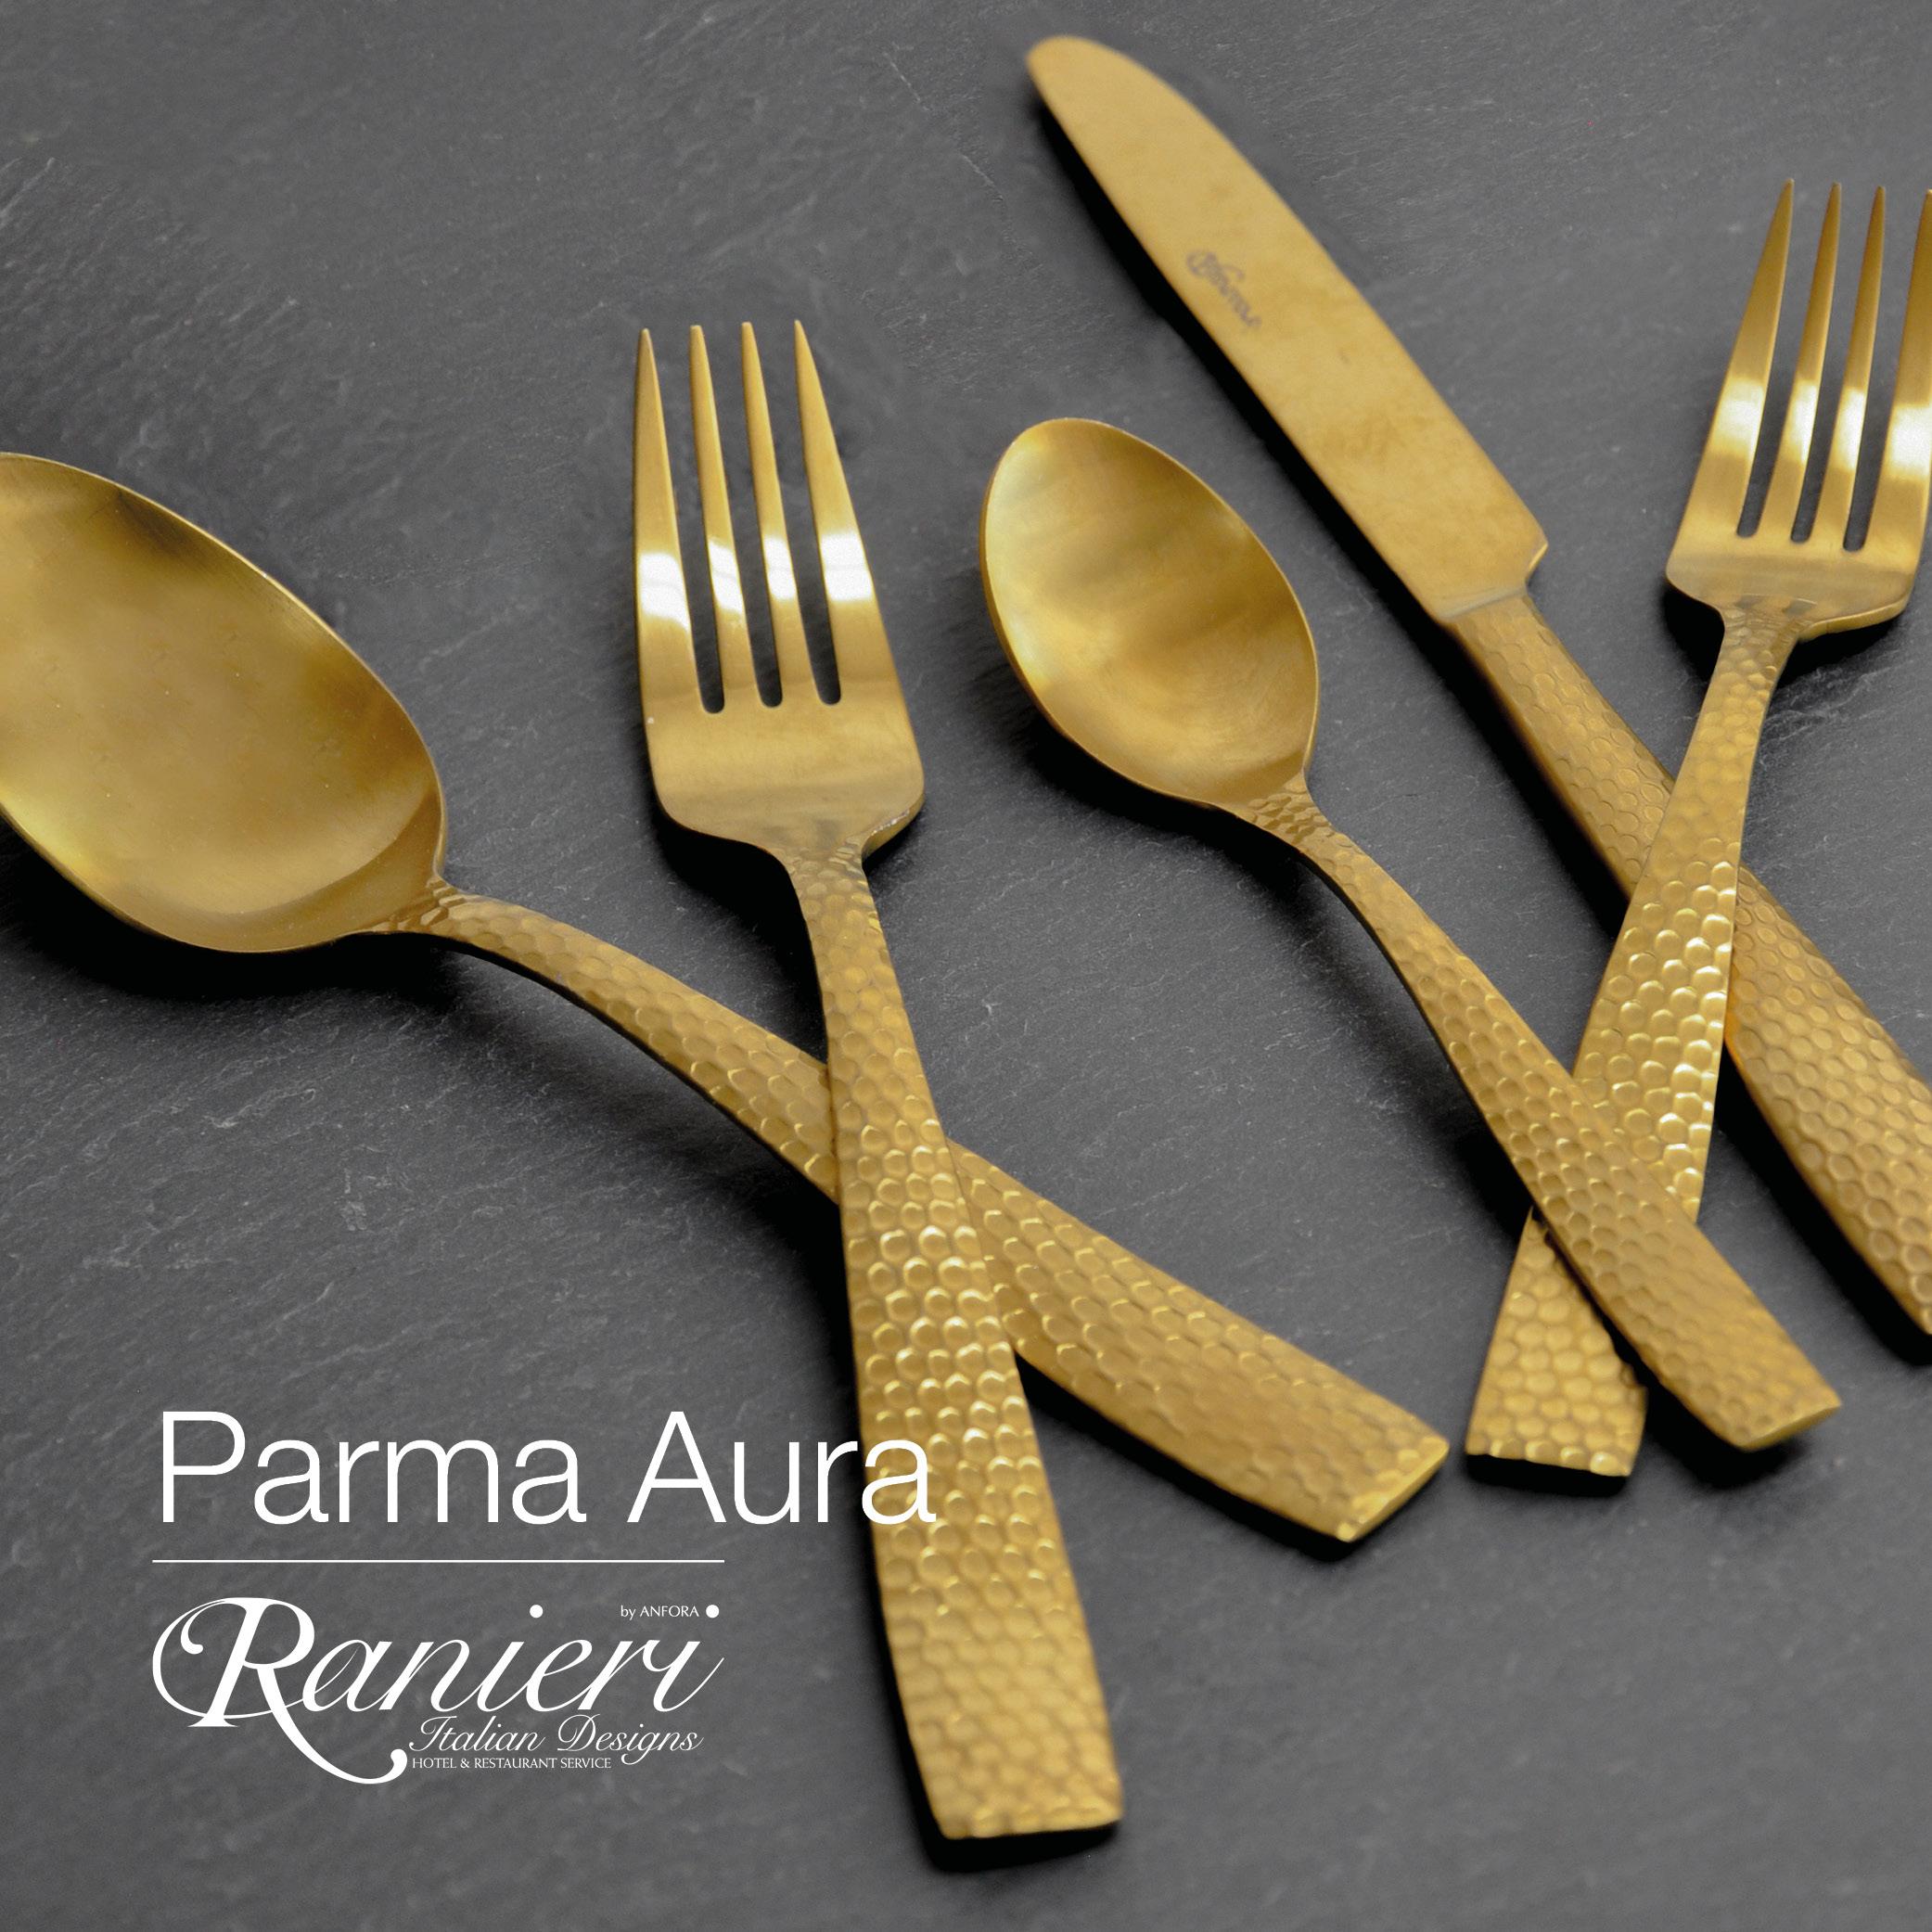 Parma Aura